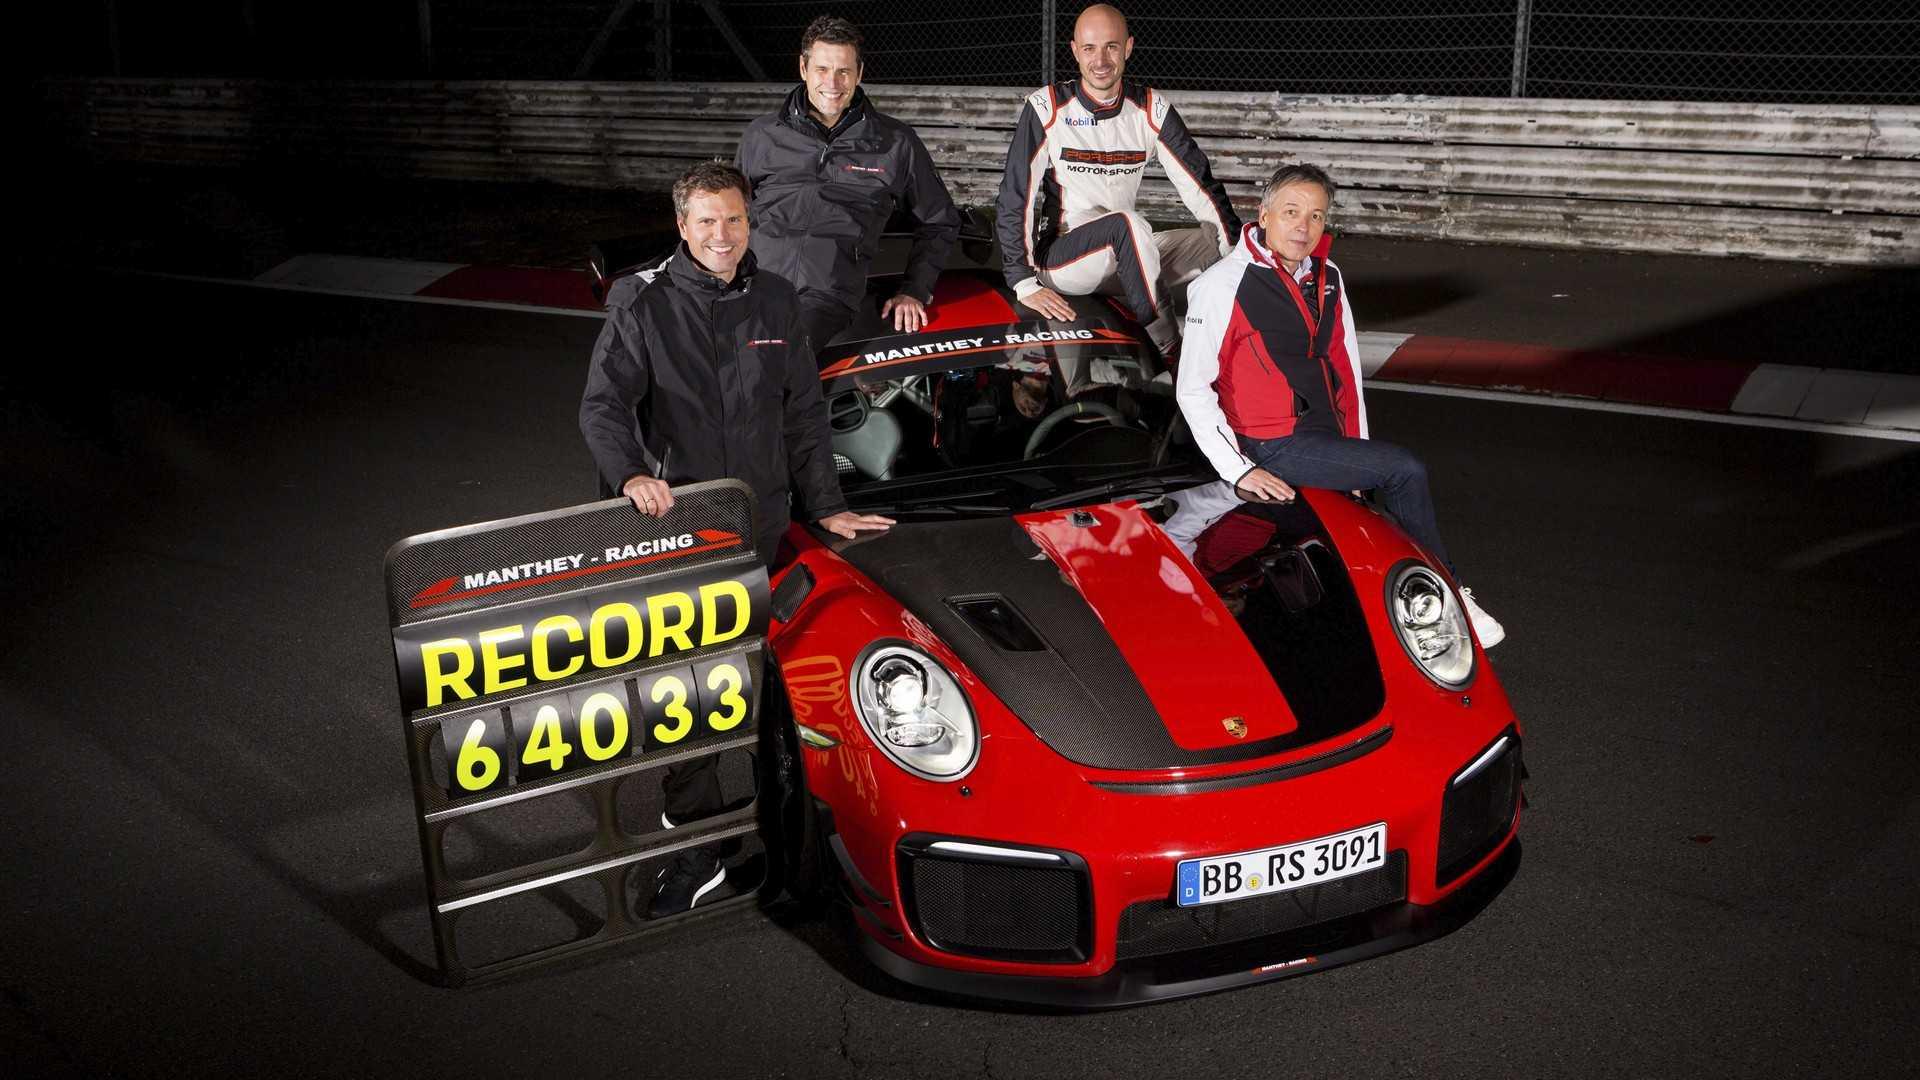 Porsche ponovo vlasnik rekorda Nirburgringa u klasi serijskih automobila (VIDEO)